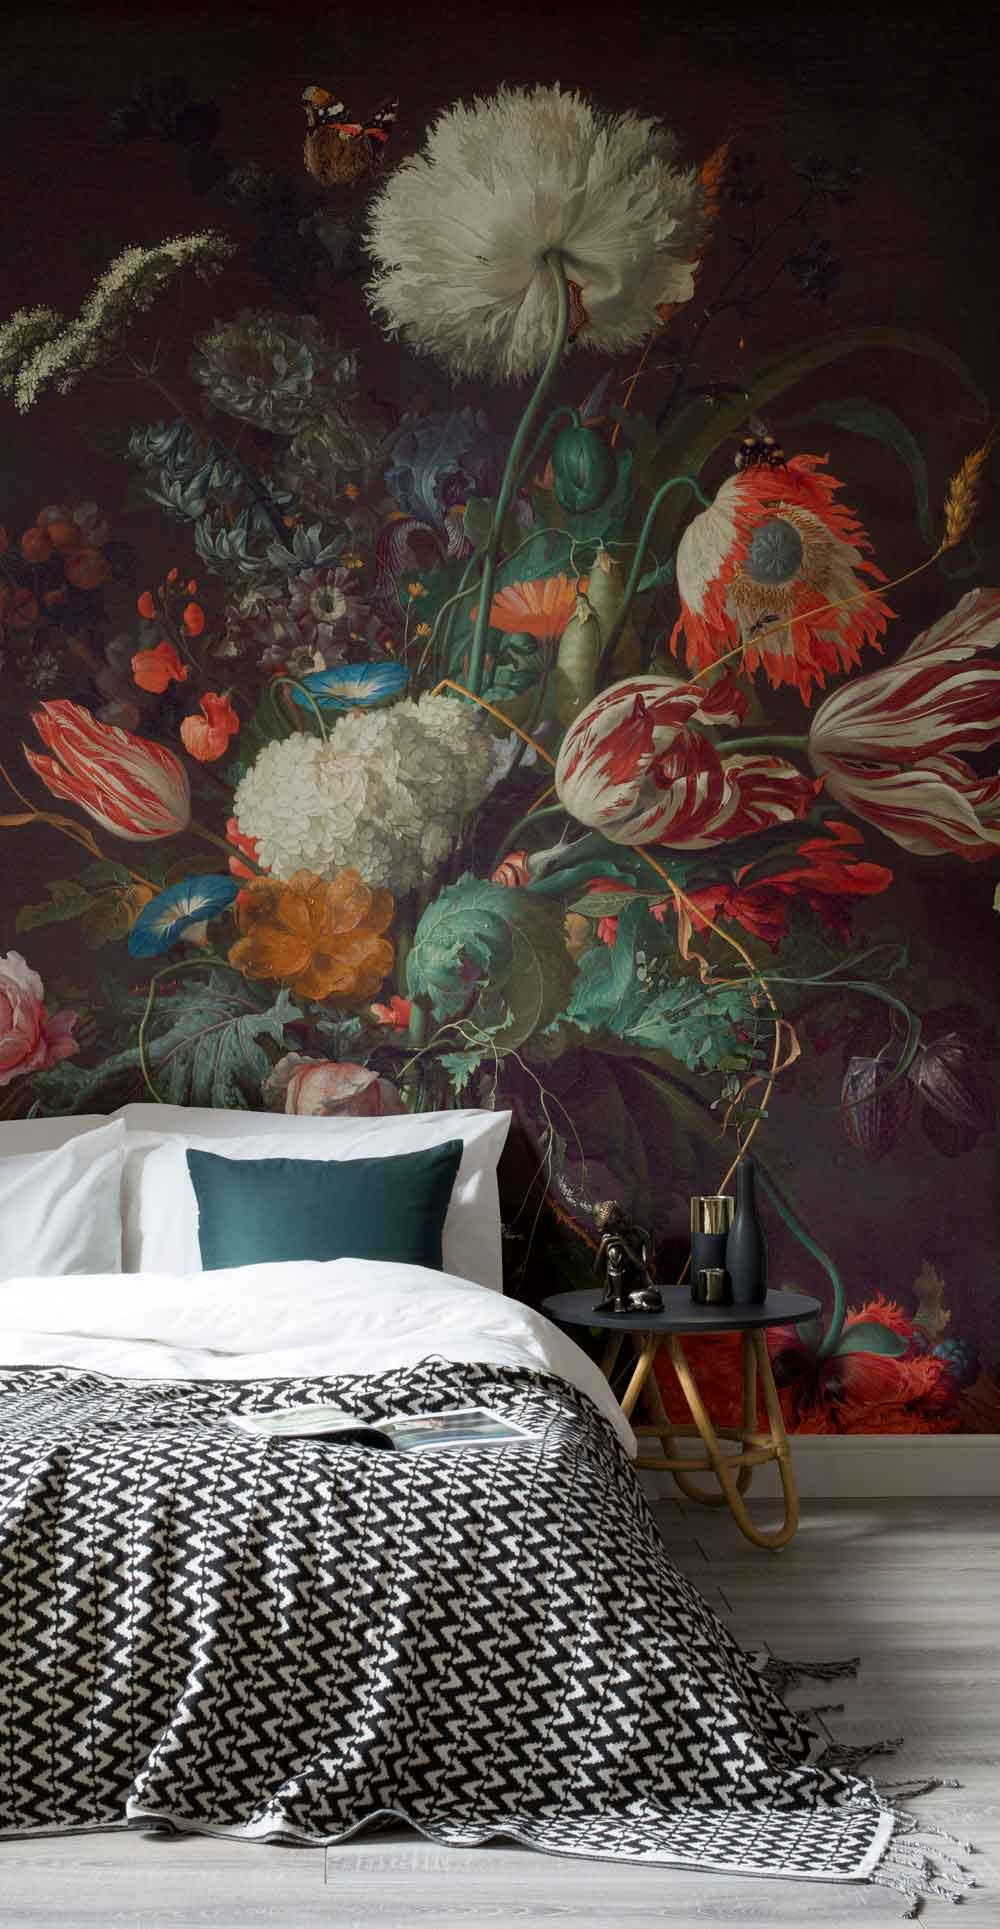 Art Mural vase of Flowers by de Heem